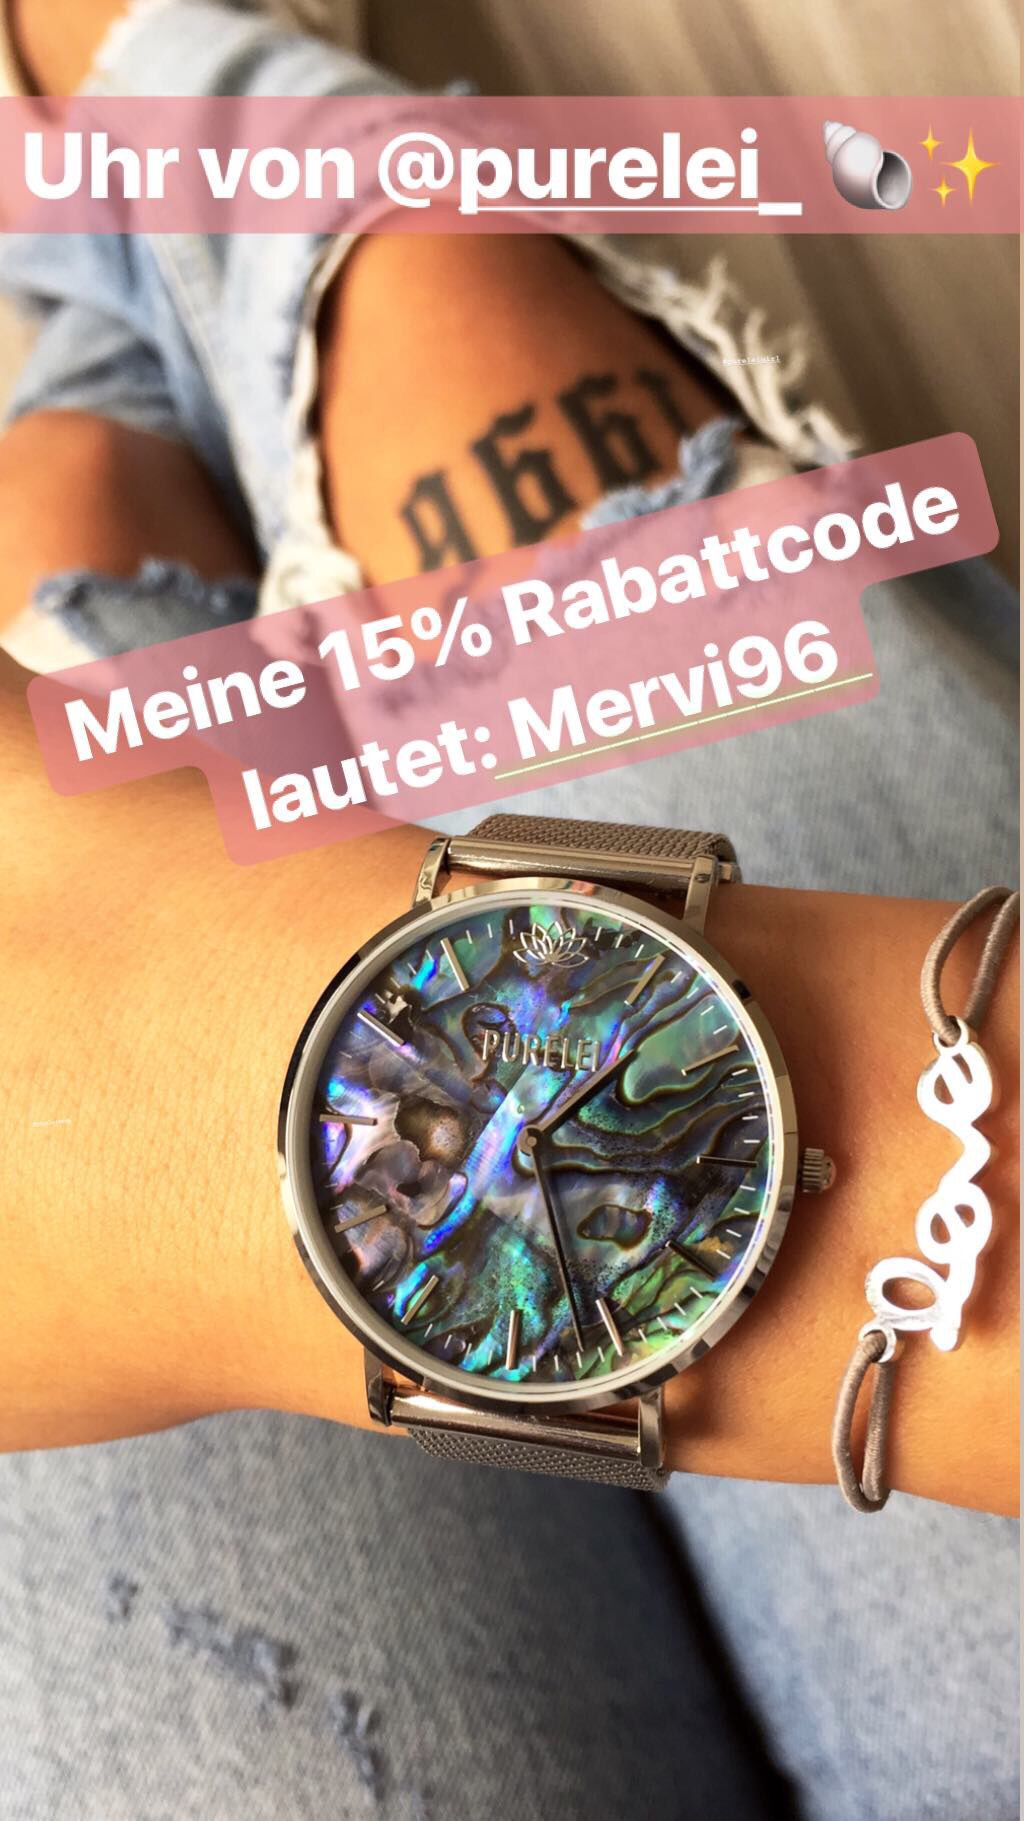 Purelei Rabattcode Instagram Rabattcode Rabattcodepurelei 15